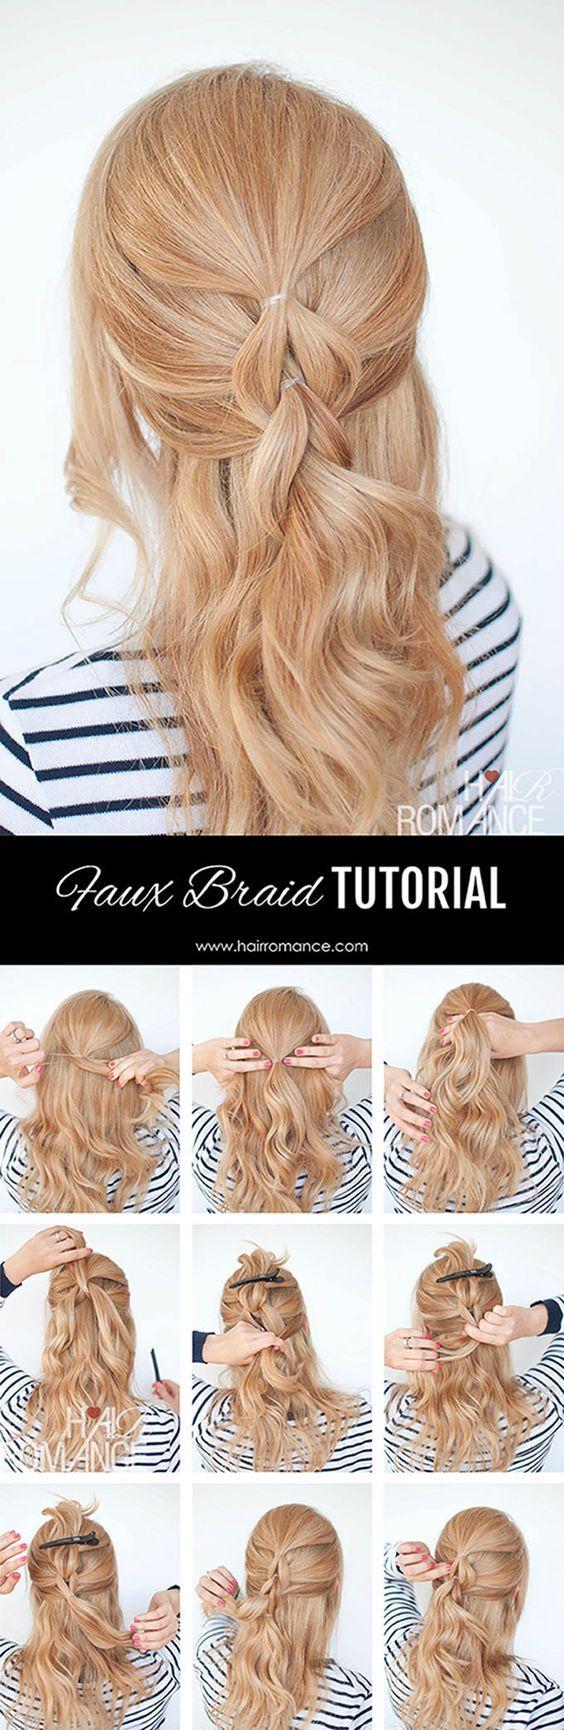 easy half up half down hairstyles step by step hair